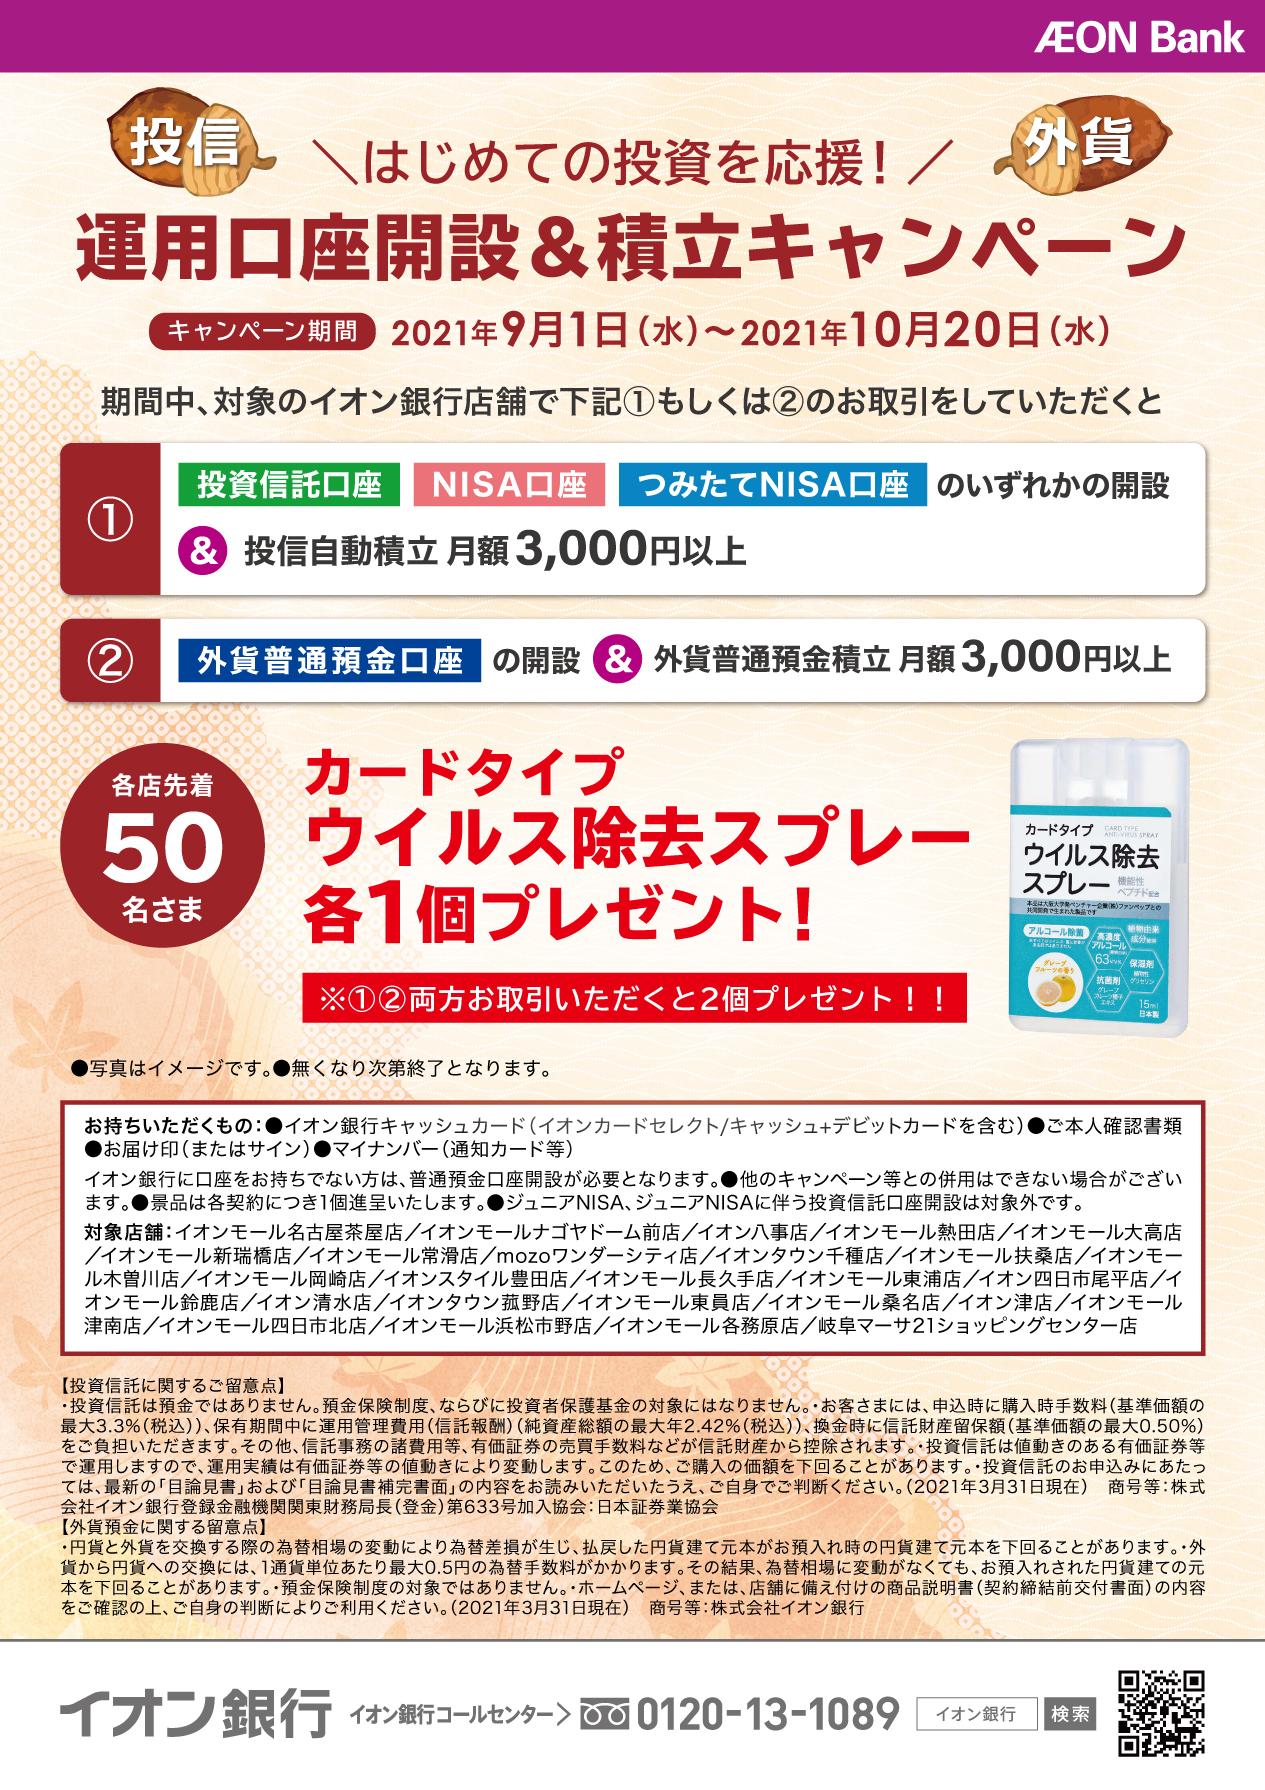 A4チラシデータ jpeg(ショップニュース画像兼用).jpg